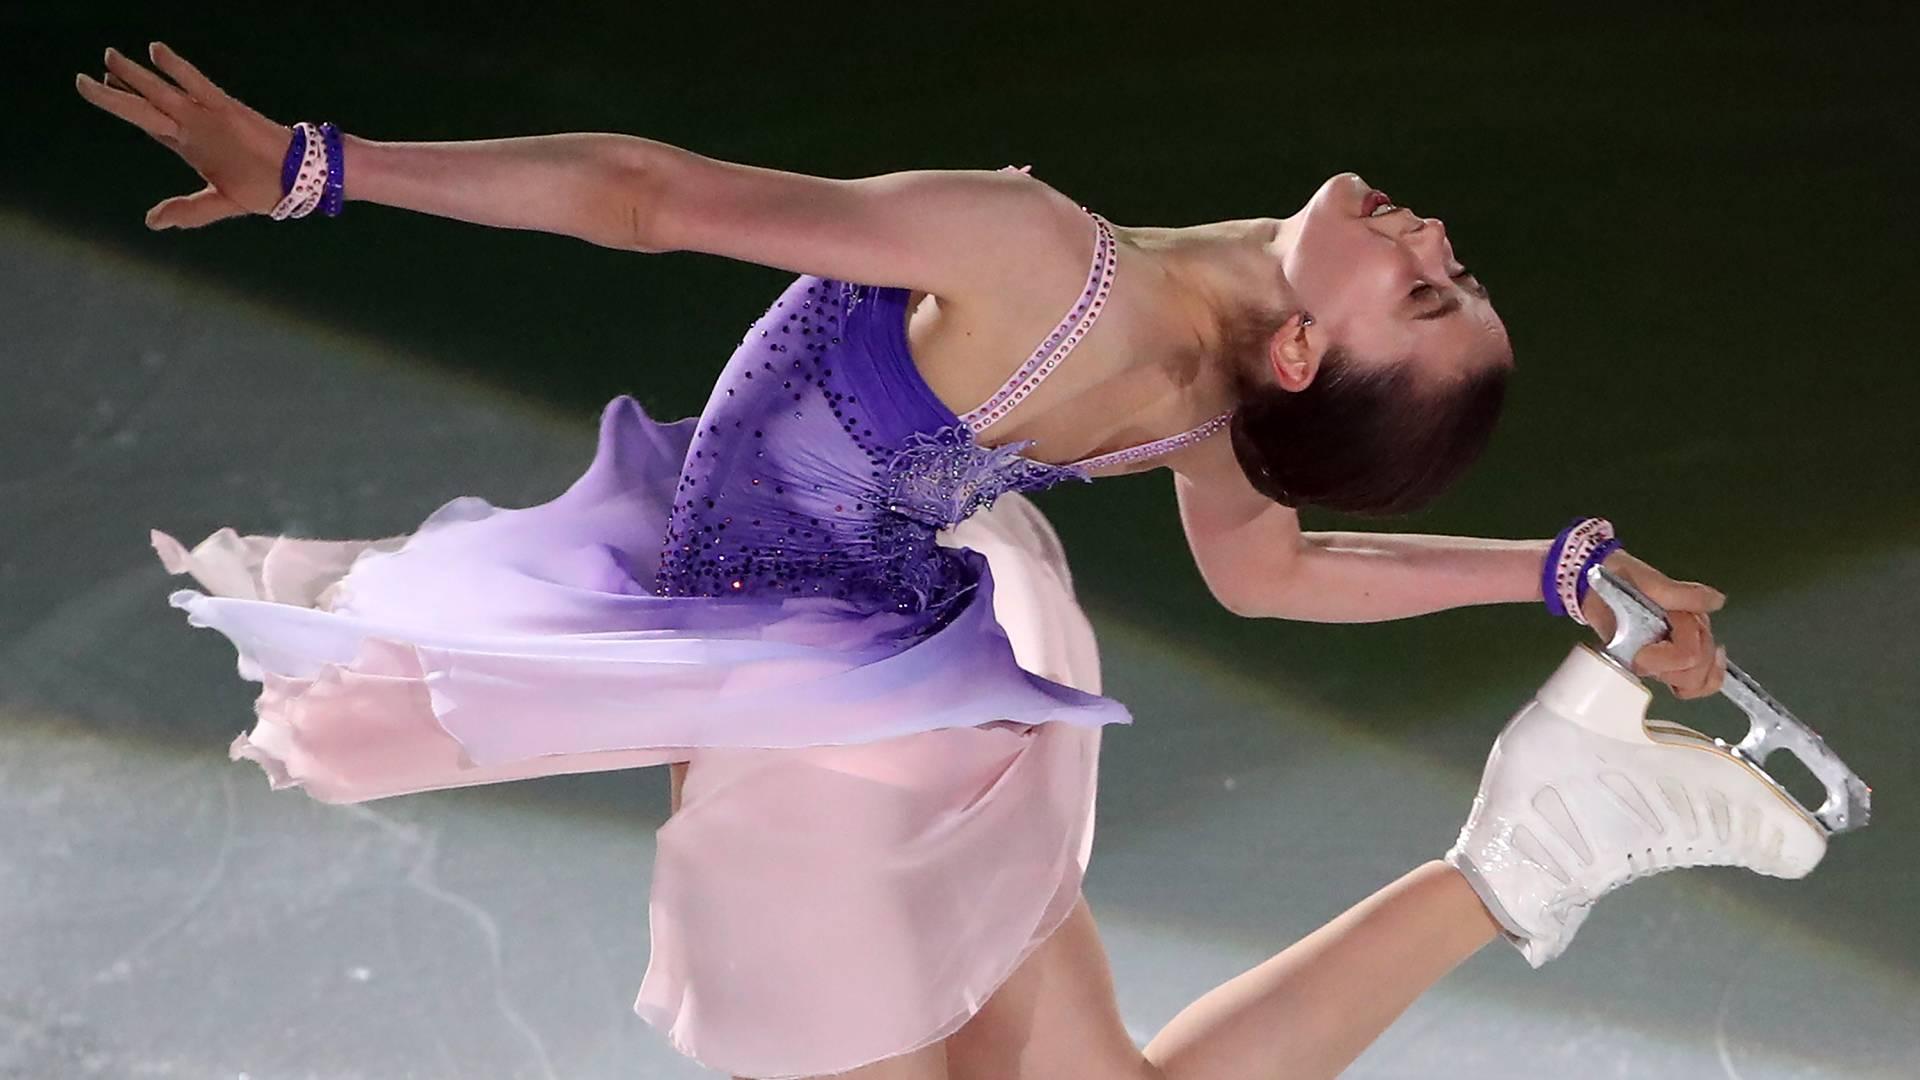 Фигуристка Валиева побила мировой рекорд по сумме двух программ0